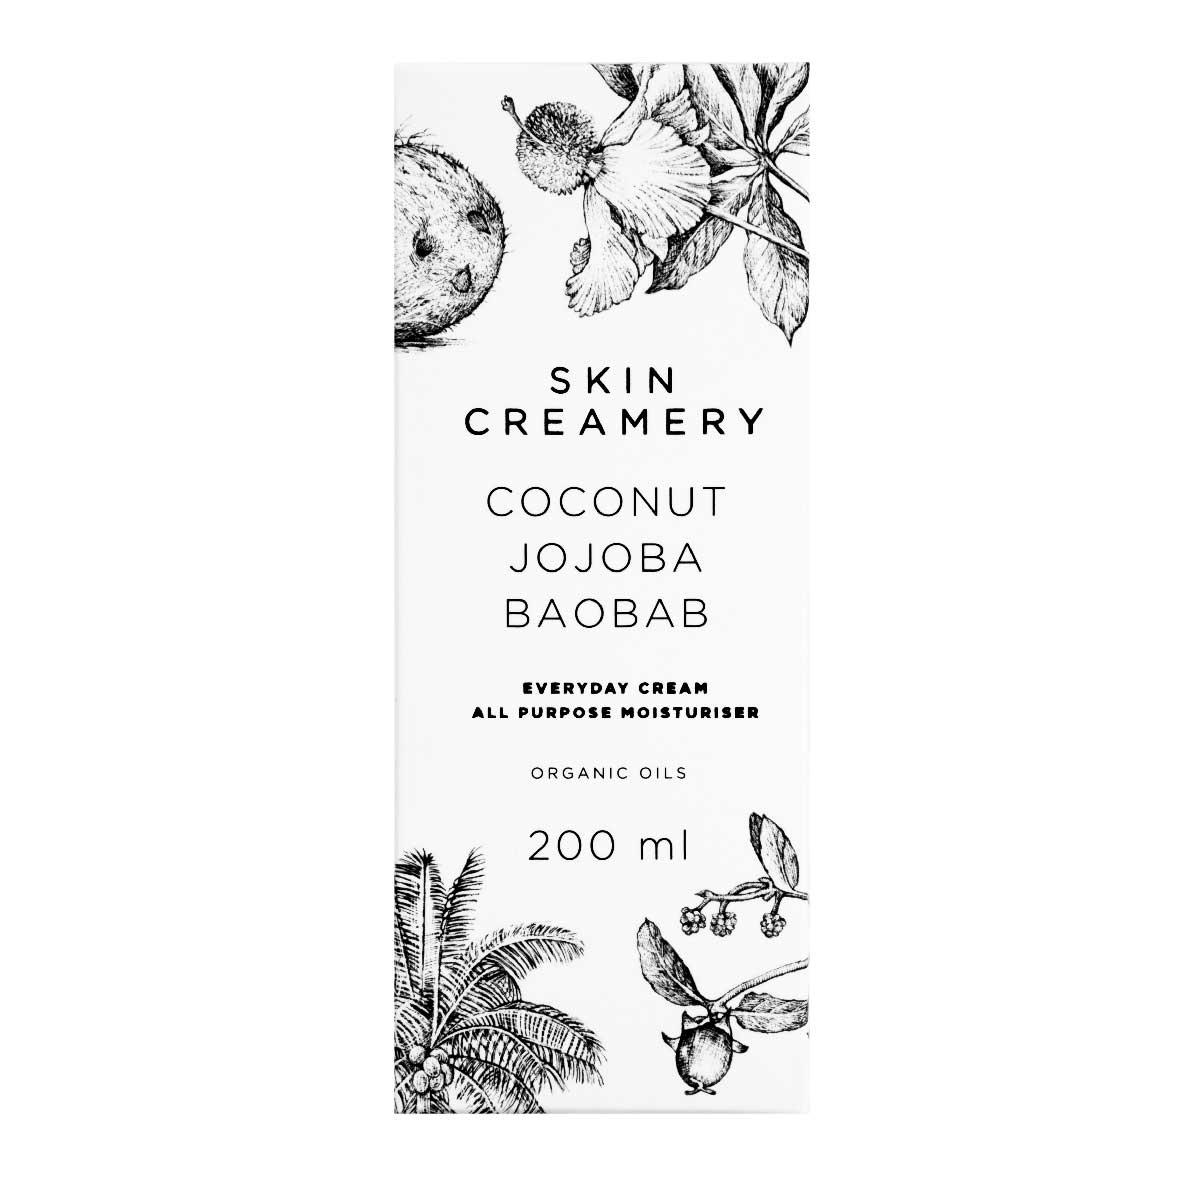 Everyday Cream by Skin Creamery